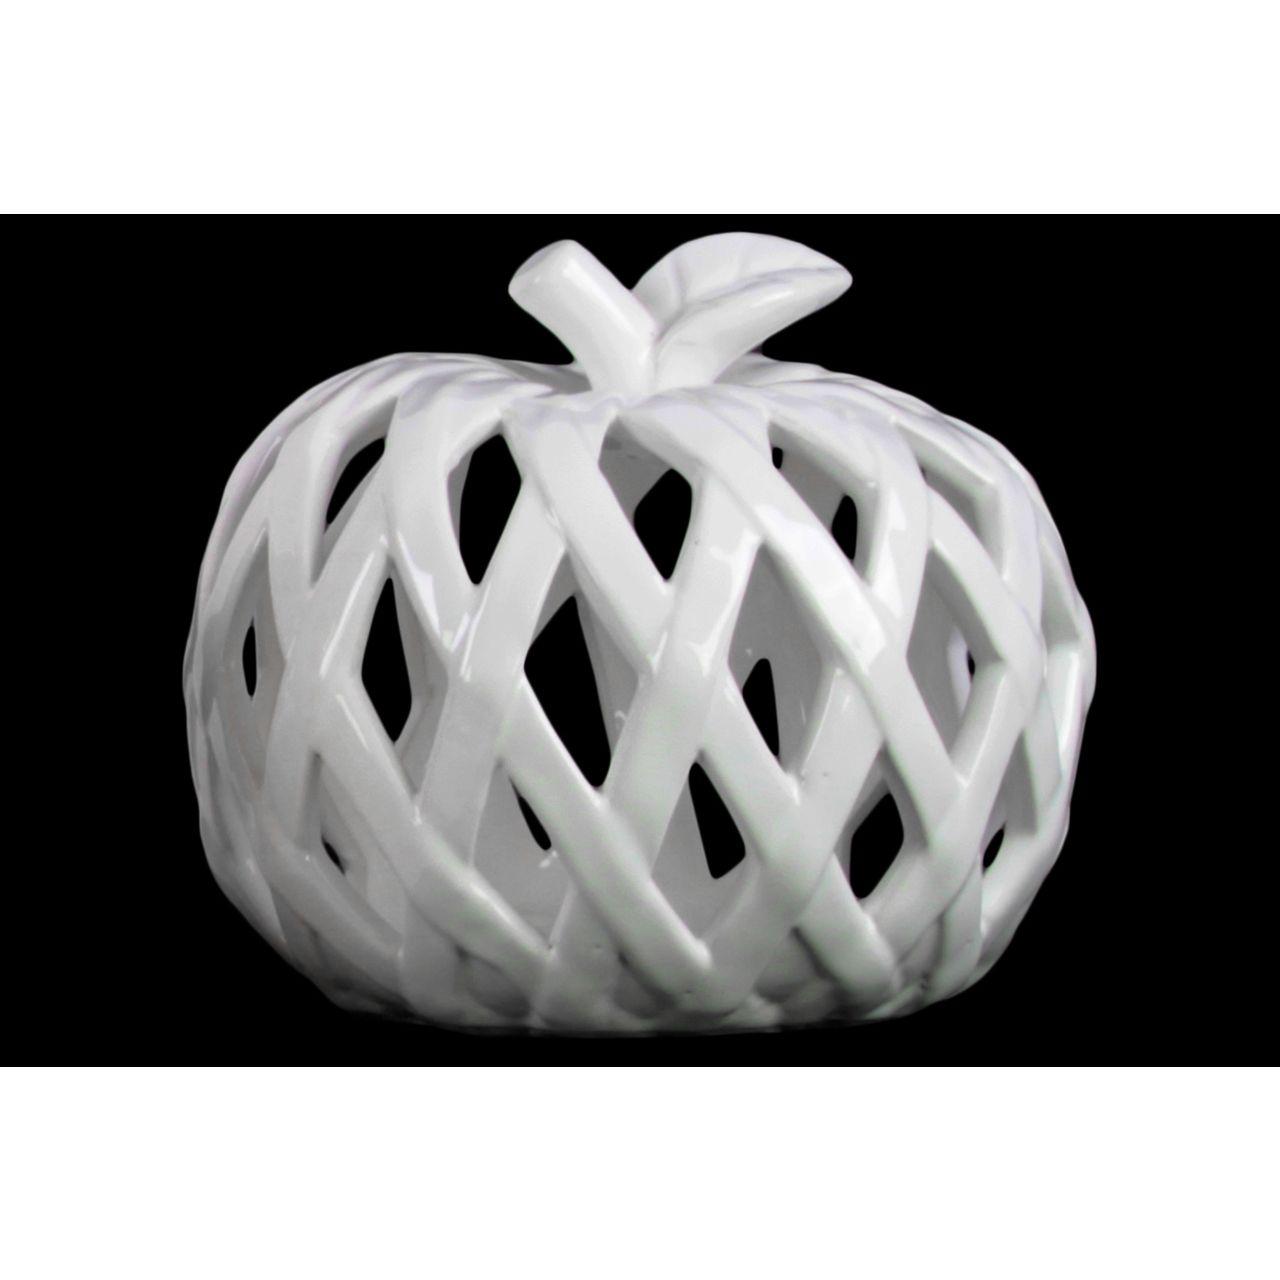 Ceramic Apple Figurine with Leaf on Stem and Cutout Design